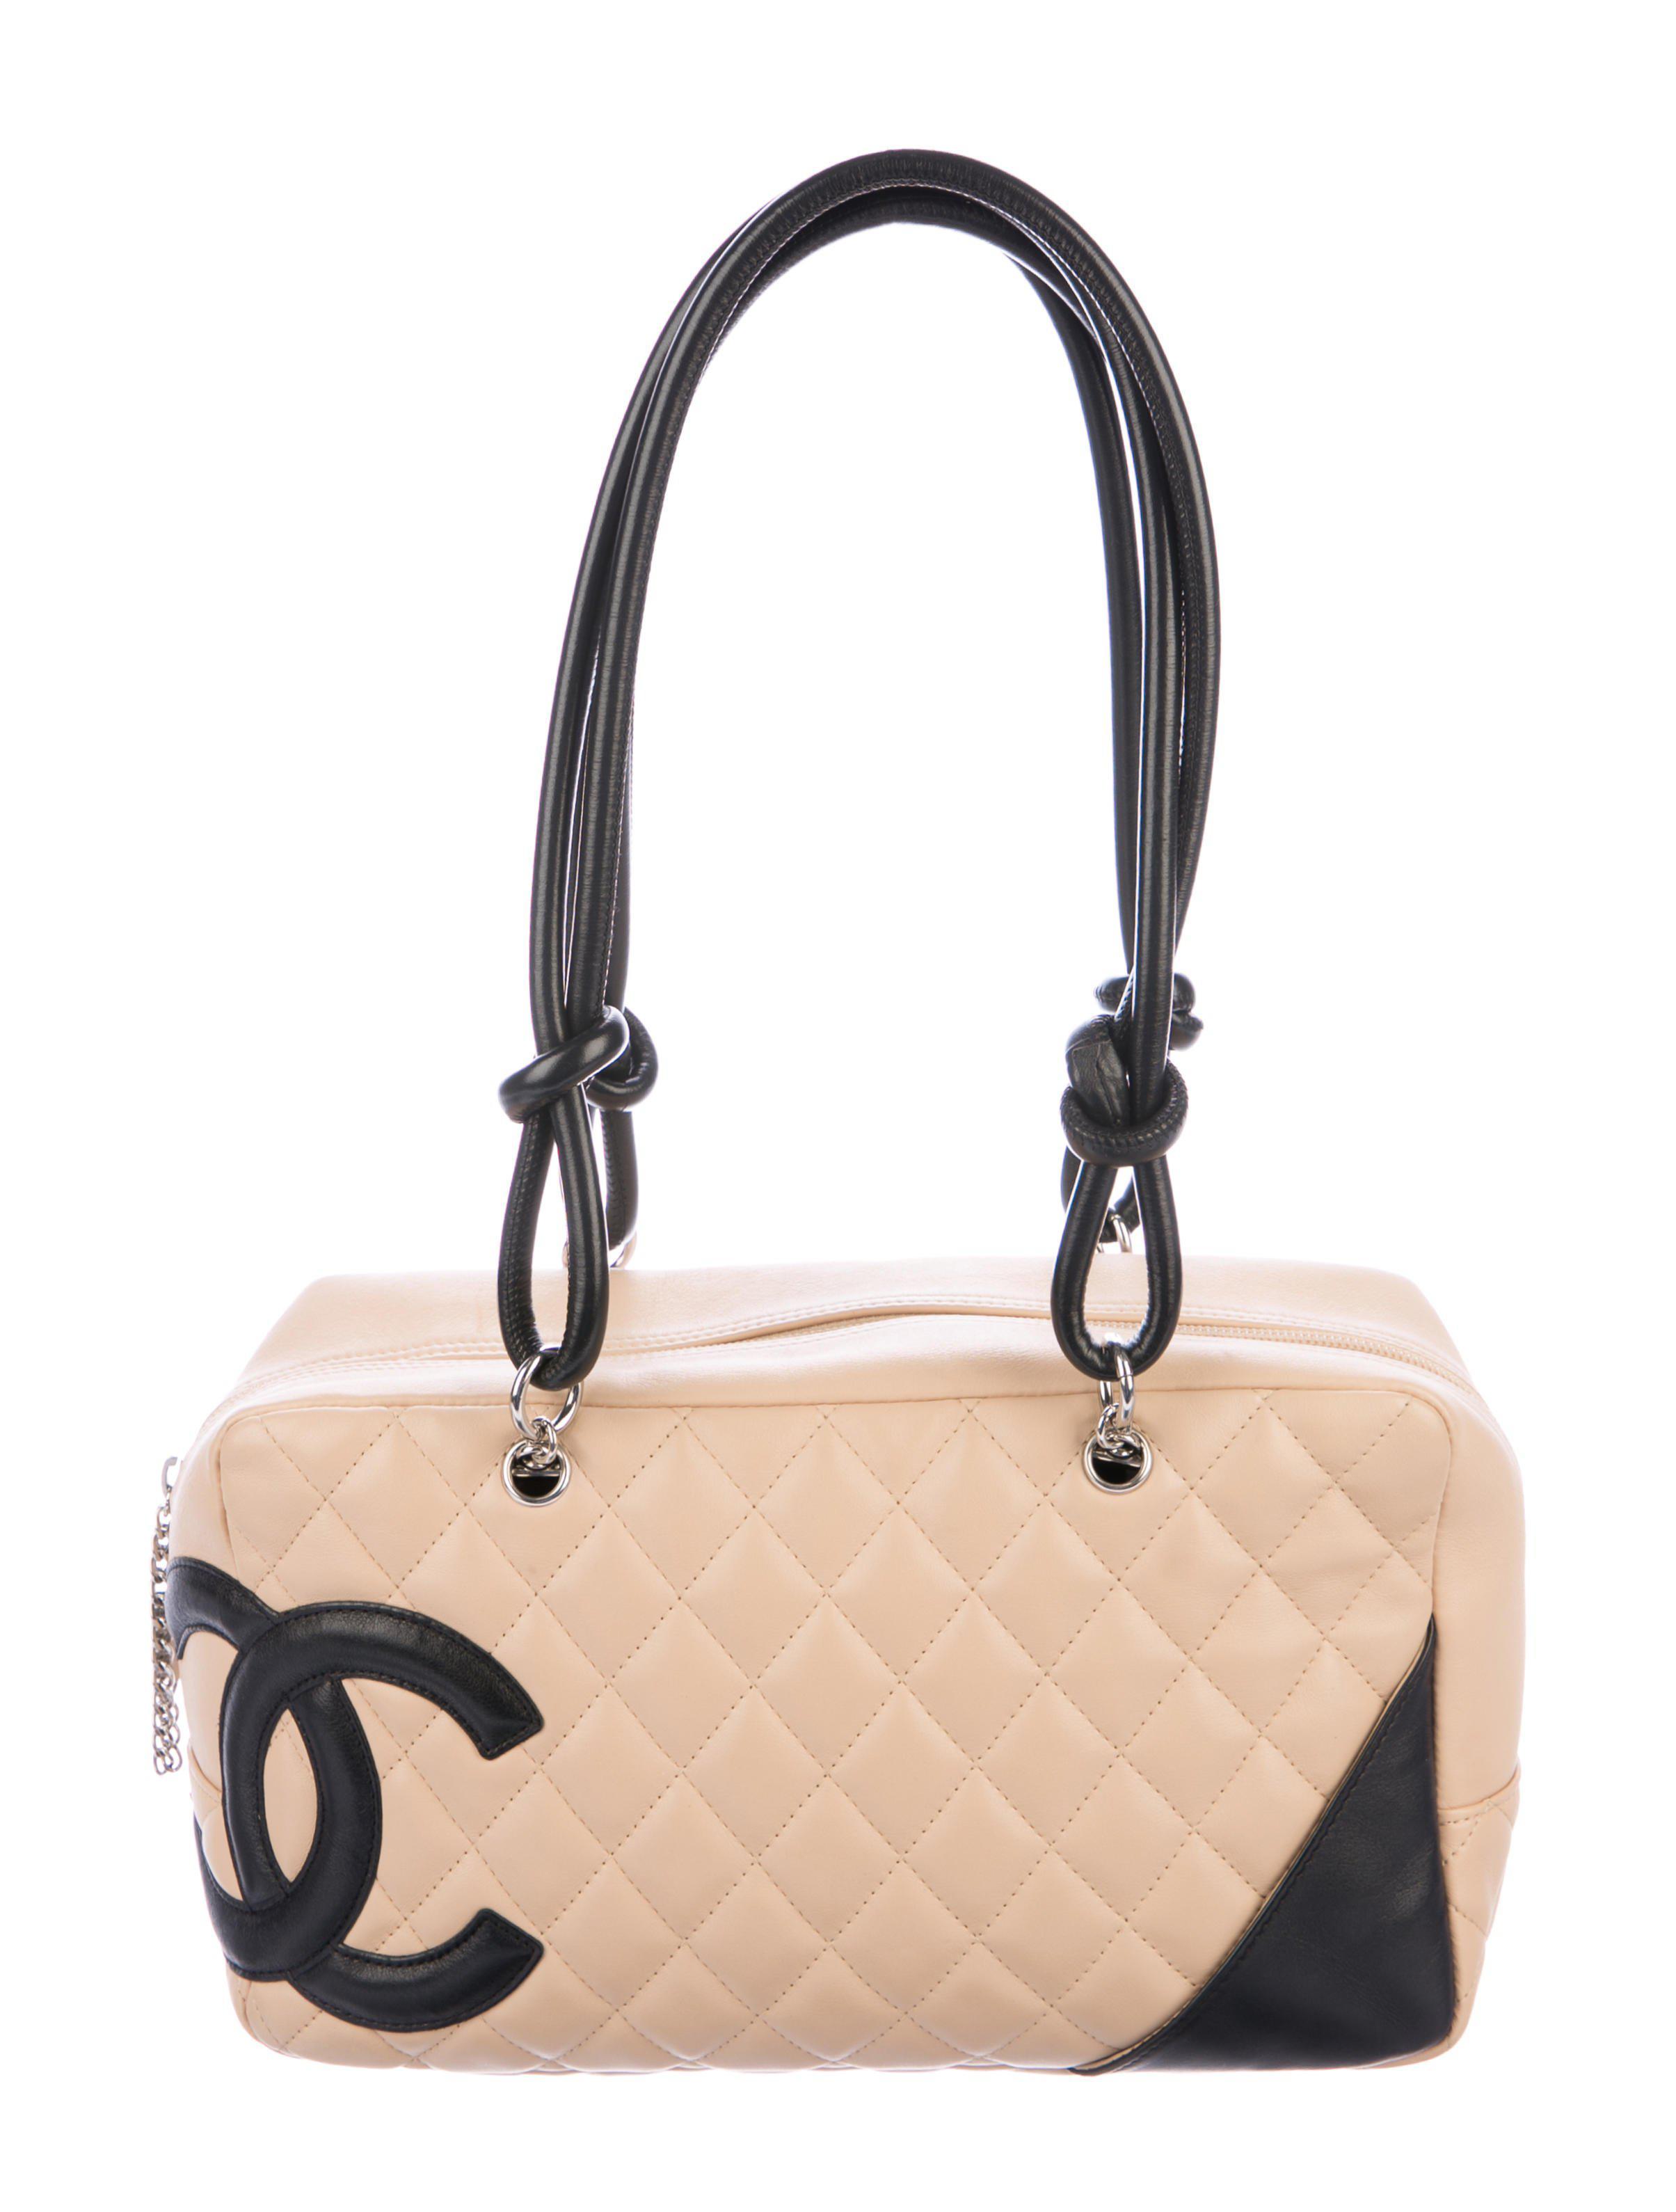 d7fb5991a7 Lyst - Chanel Ligne Cambon Bowler Bag Black in Metallic